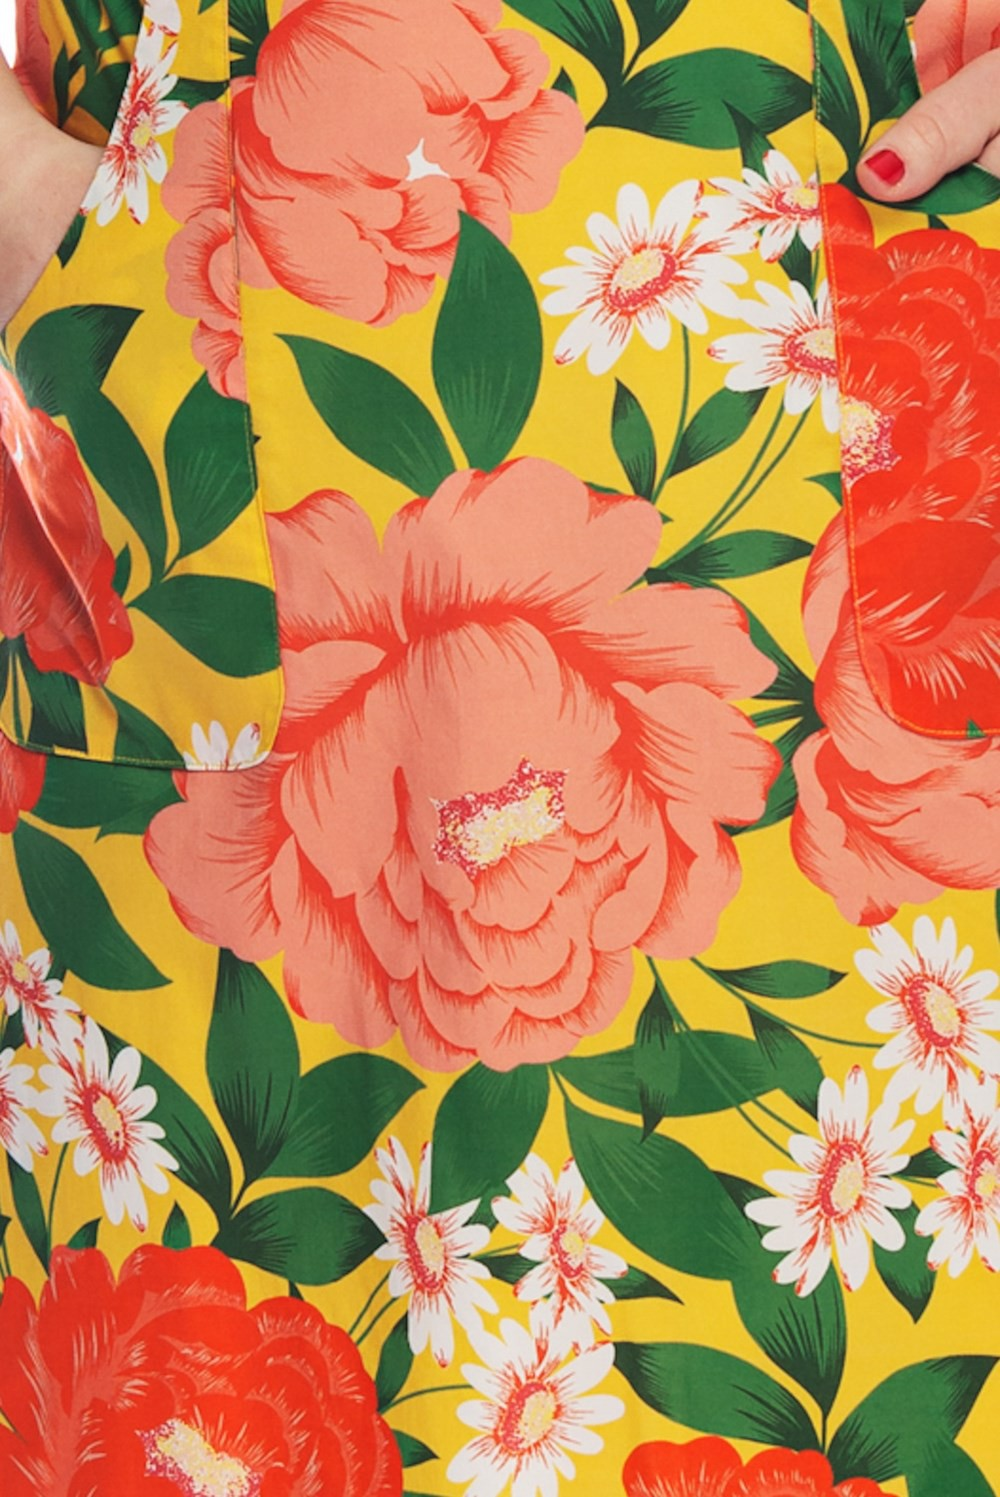 Jupe fleurie Cissi Och Selma, Sonja grosses fleurs